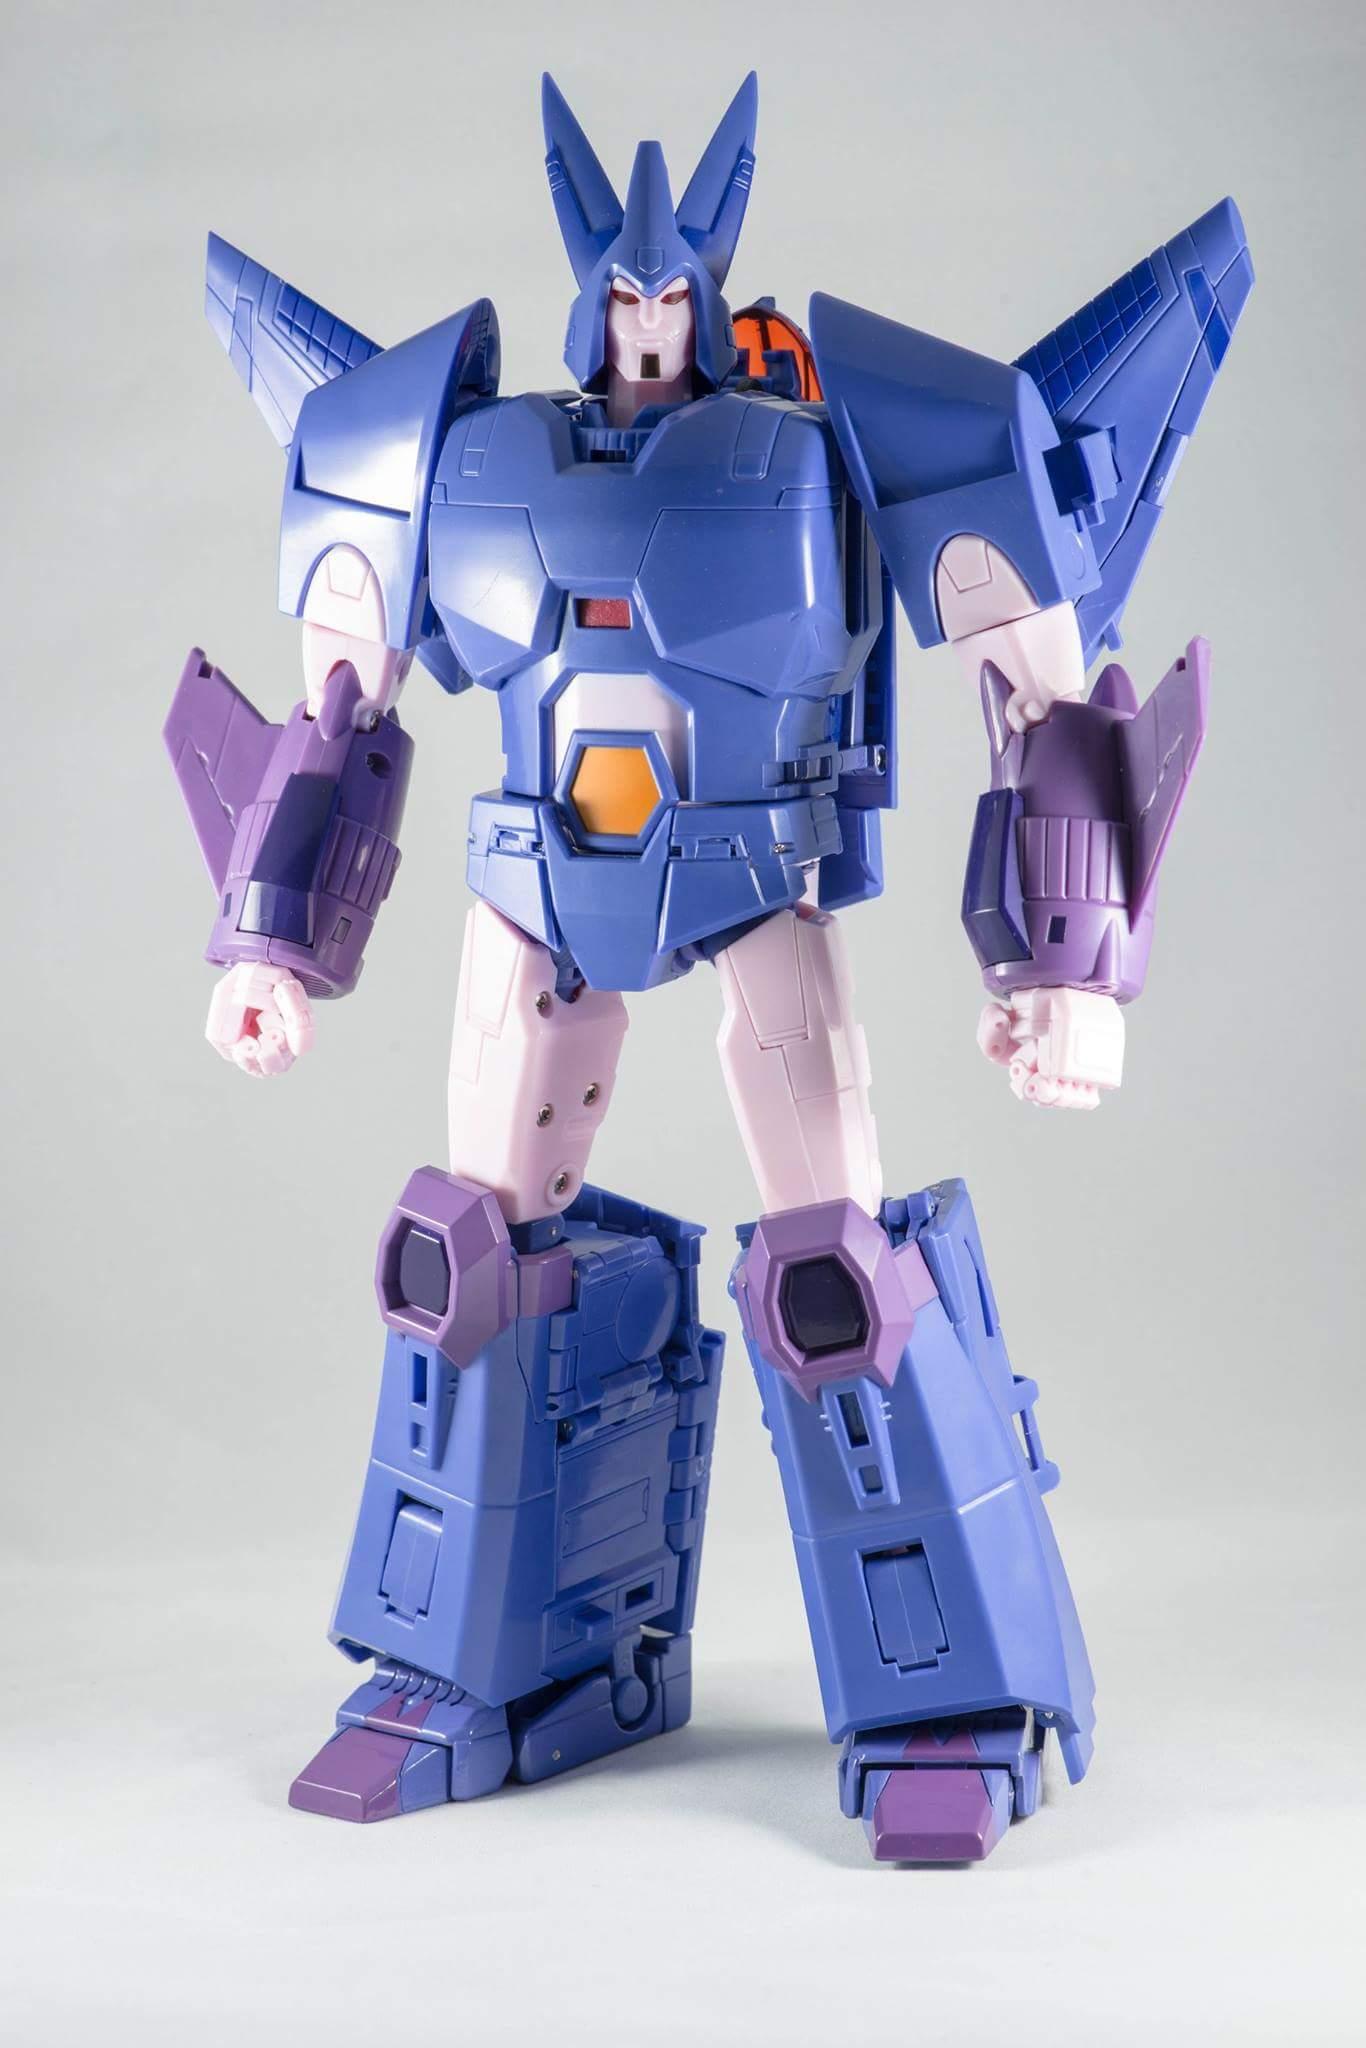 [X-Transbots] Produit Tiers - MX-III Eligos - aka Cyclonus - Page 3 FRXLJiLl